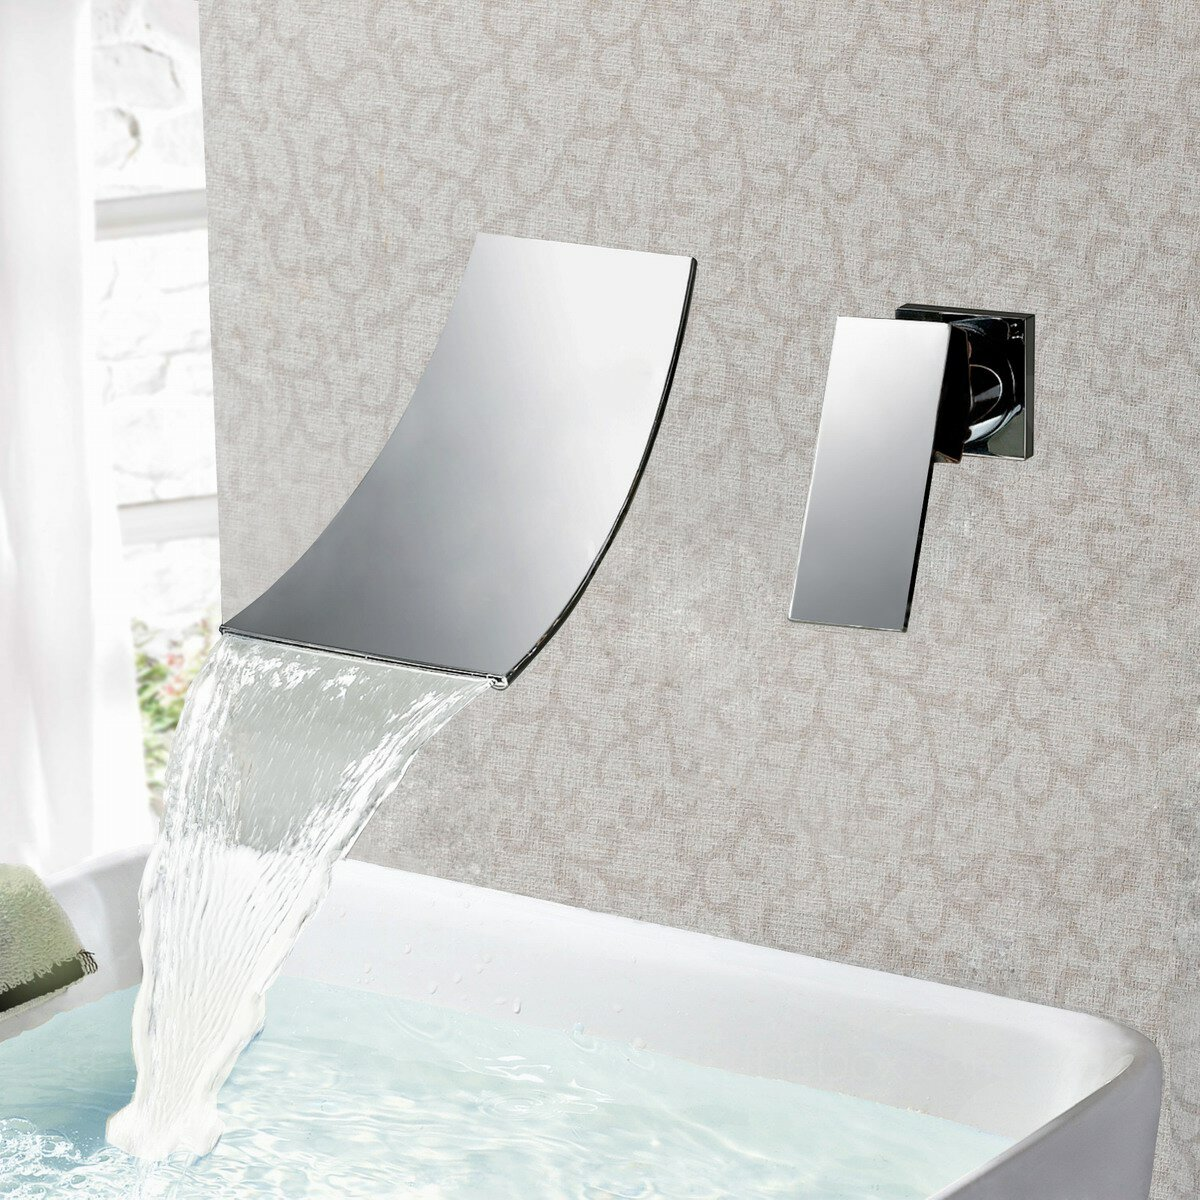 Sumerain Sink Faucet U0026 Reviews | Wayfair